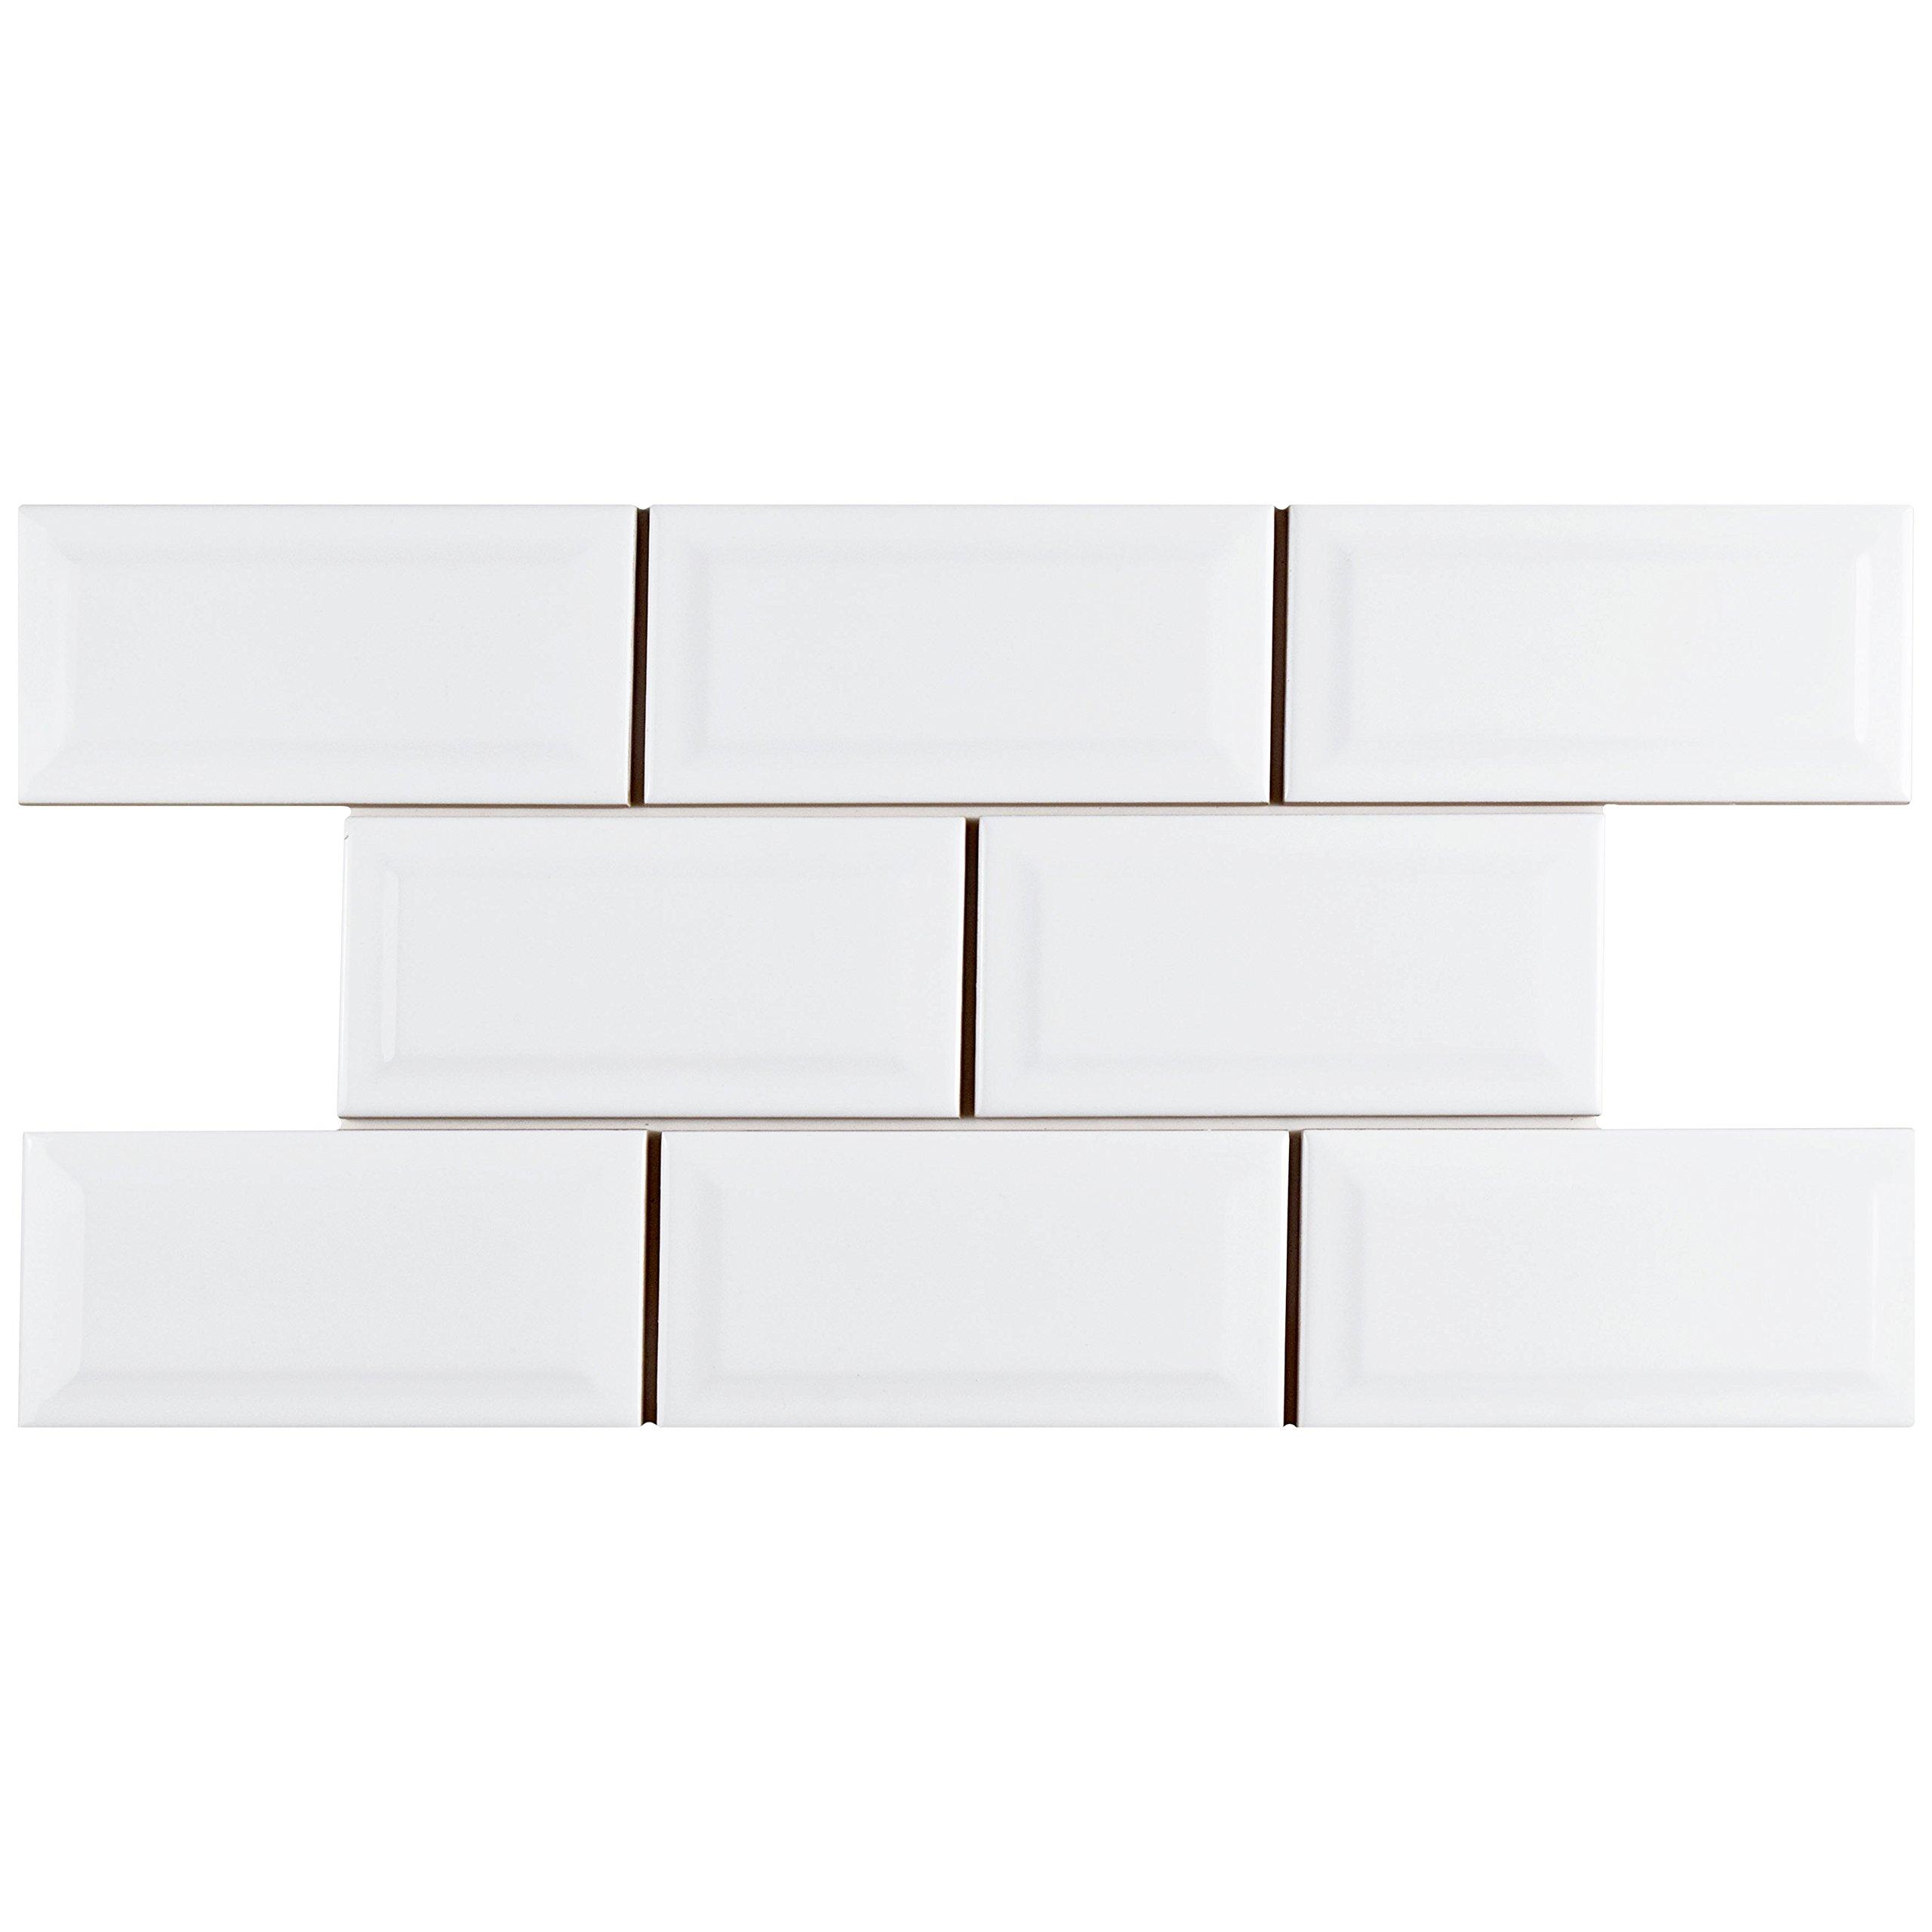 SomerTile WXR3PSBW Pente Subway Beveled Ceramic Wall Tile, 3'' x 6'', Glossy White